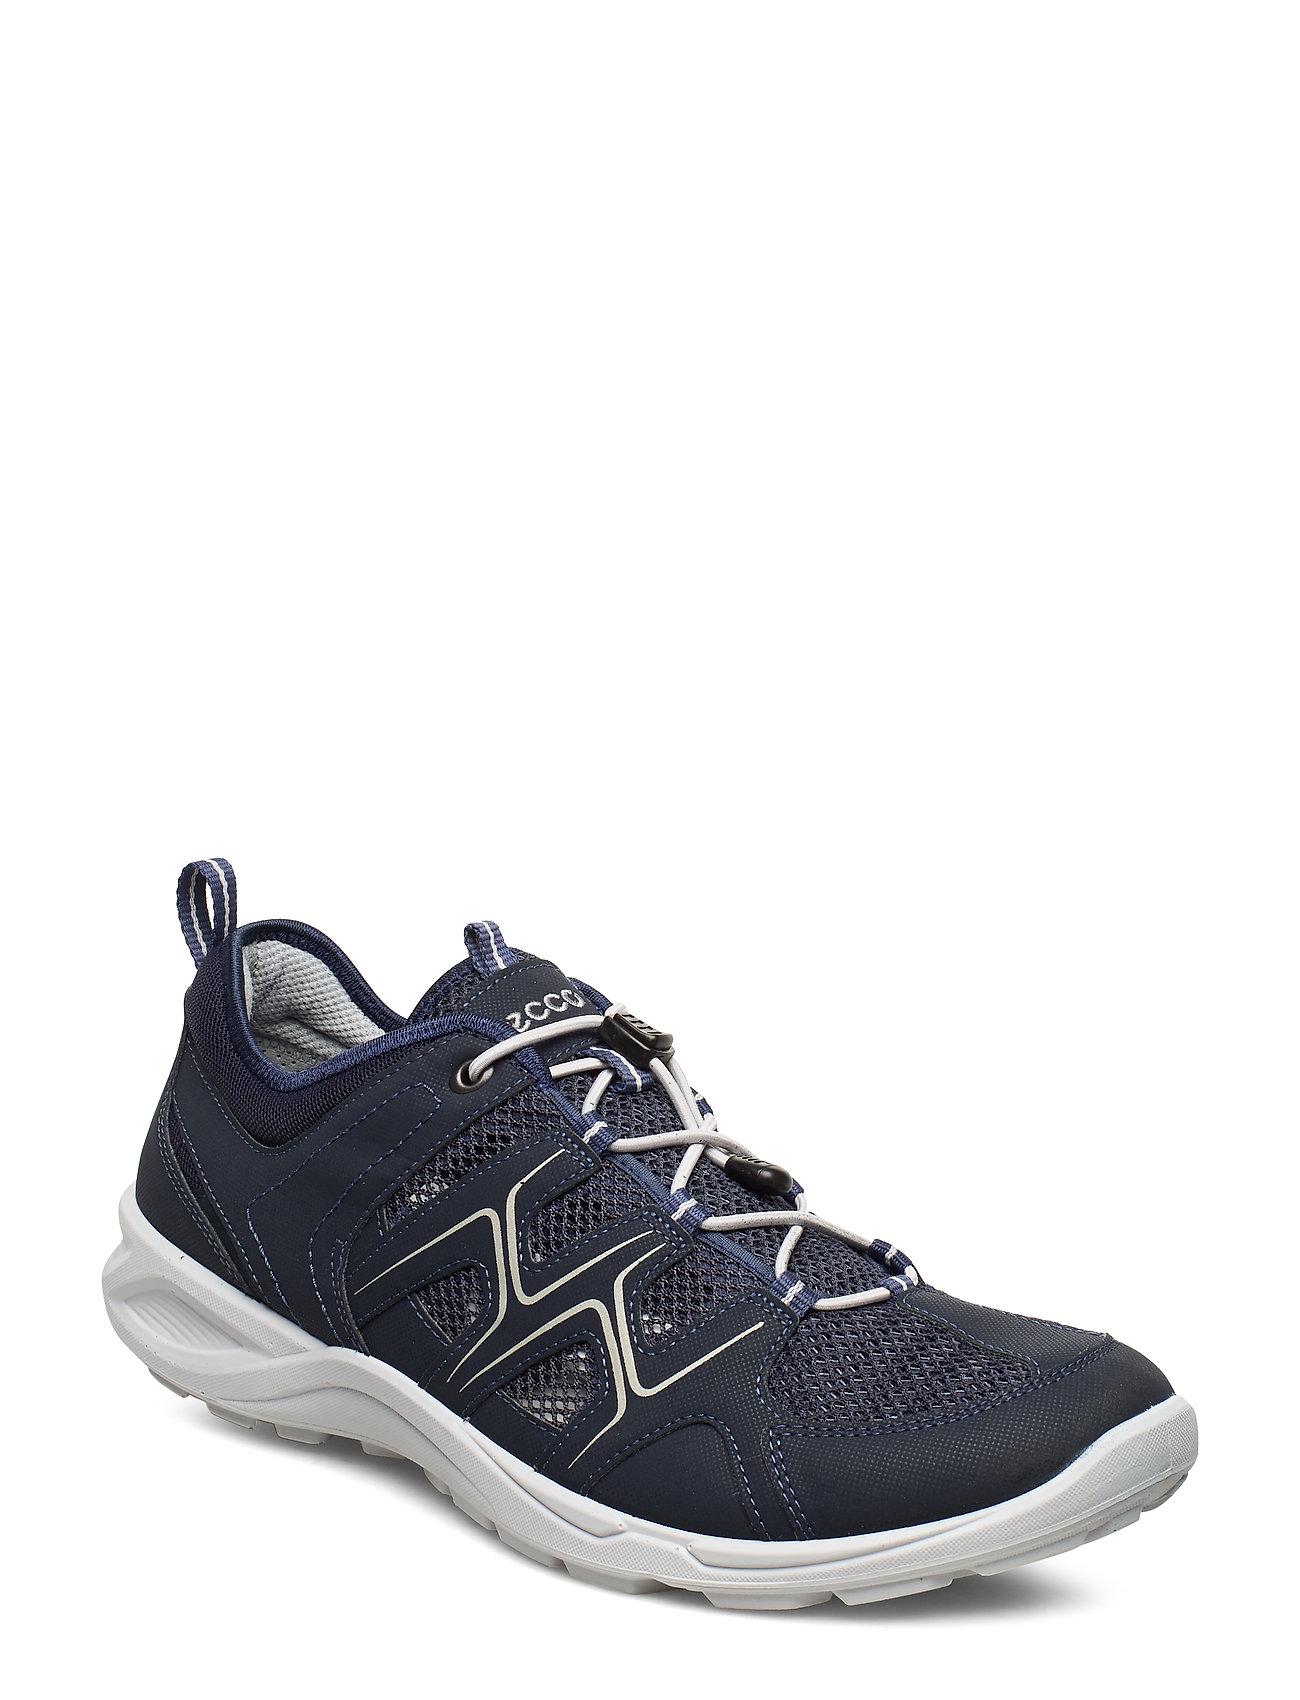 Image of Terracruise Lt M Low-top Sneakers Blå ECCO (3304134773)